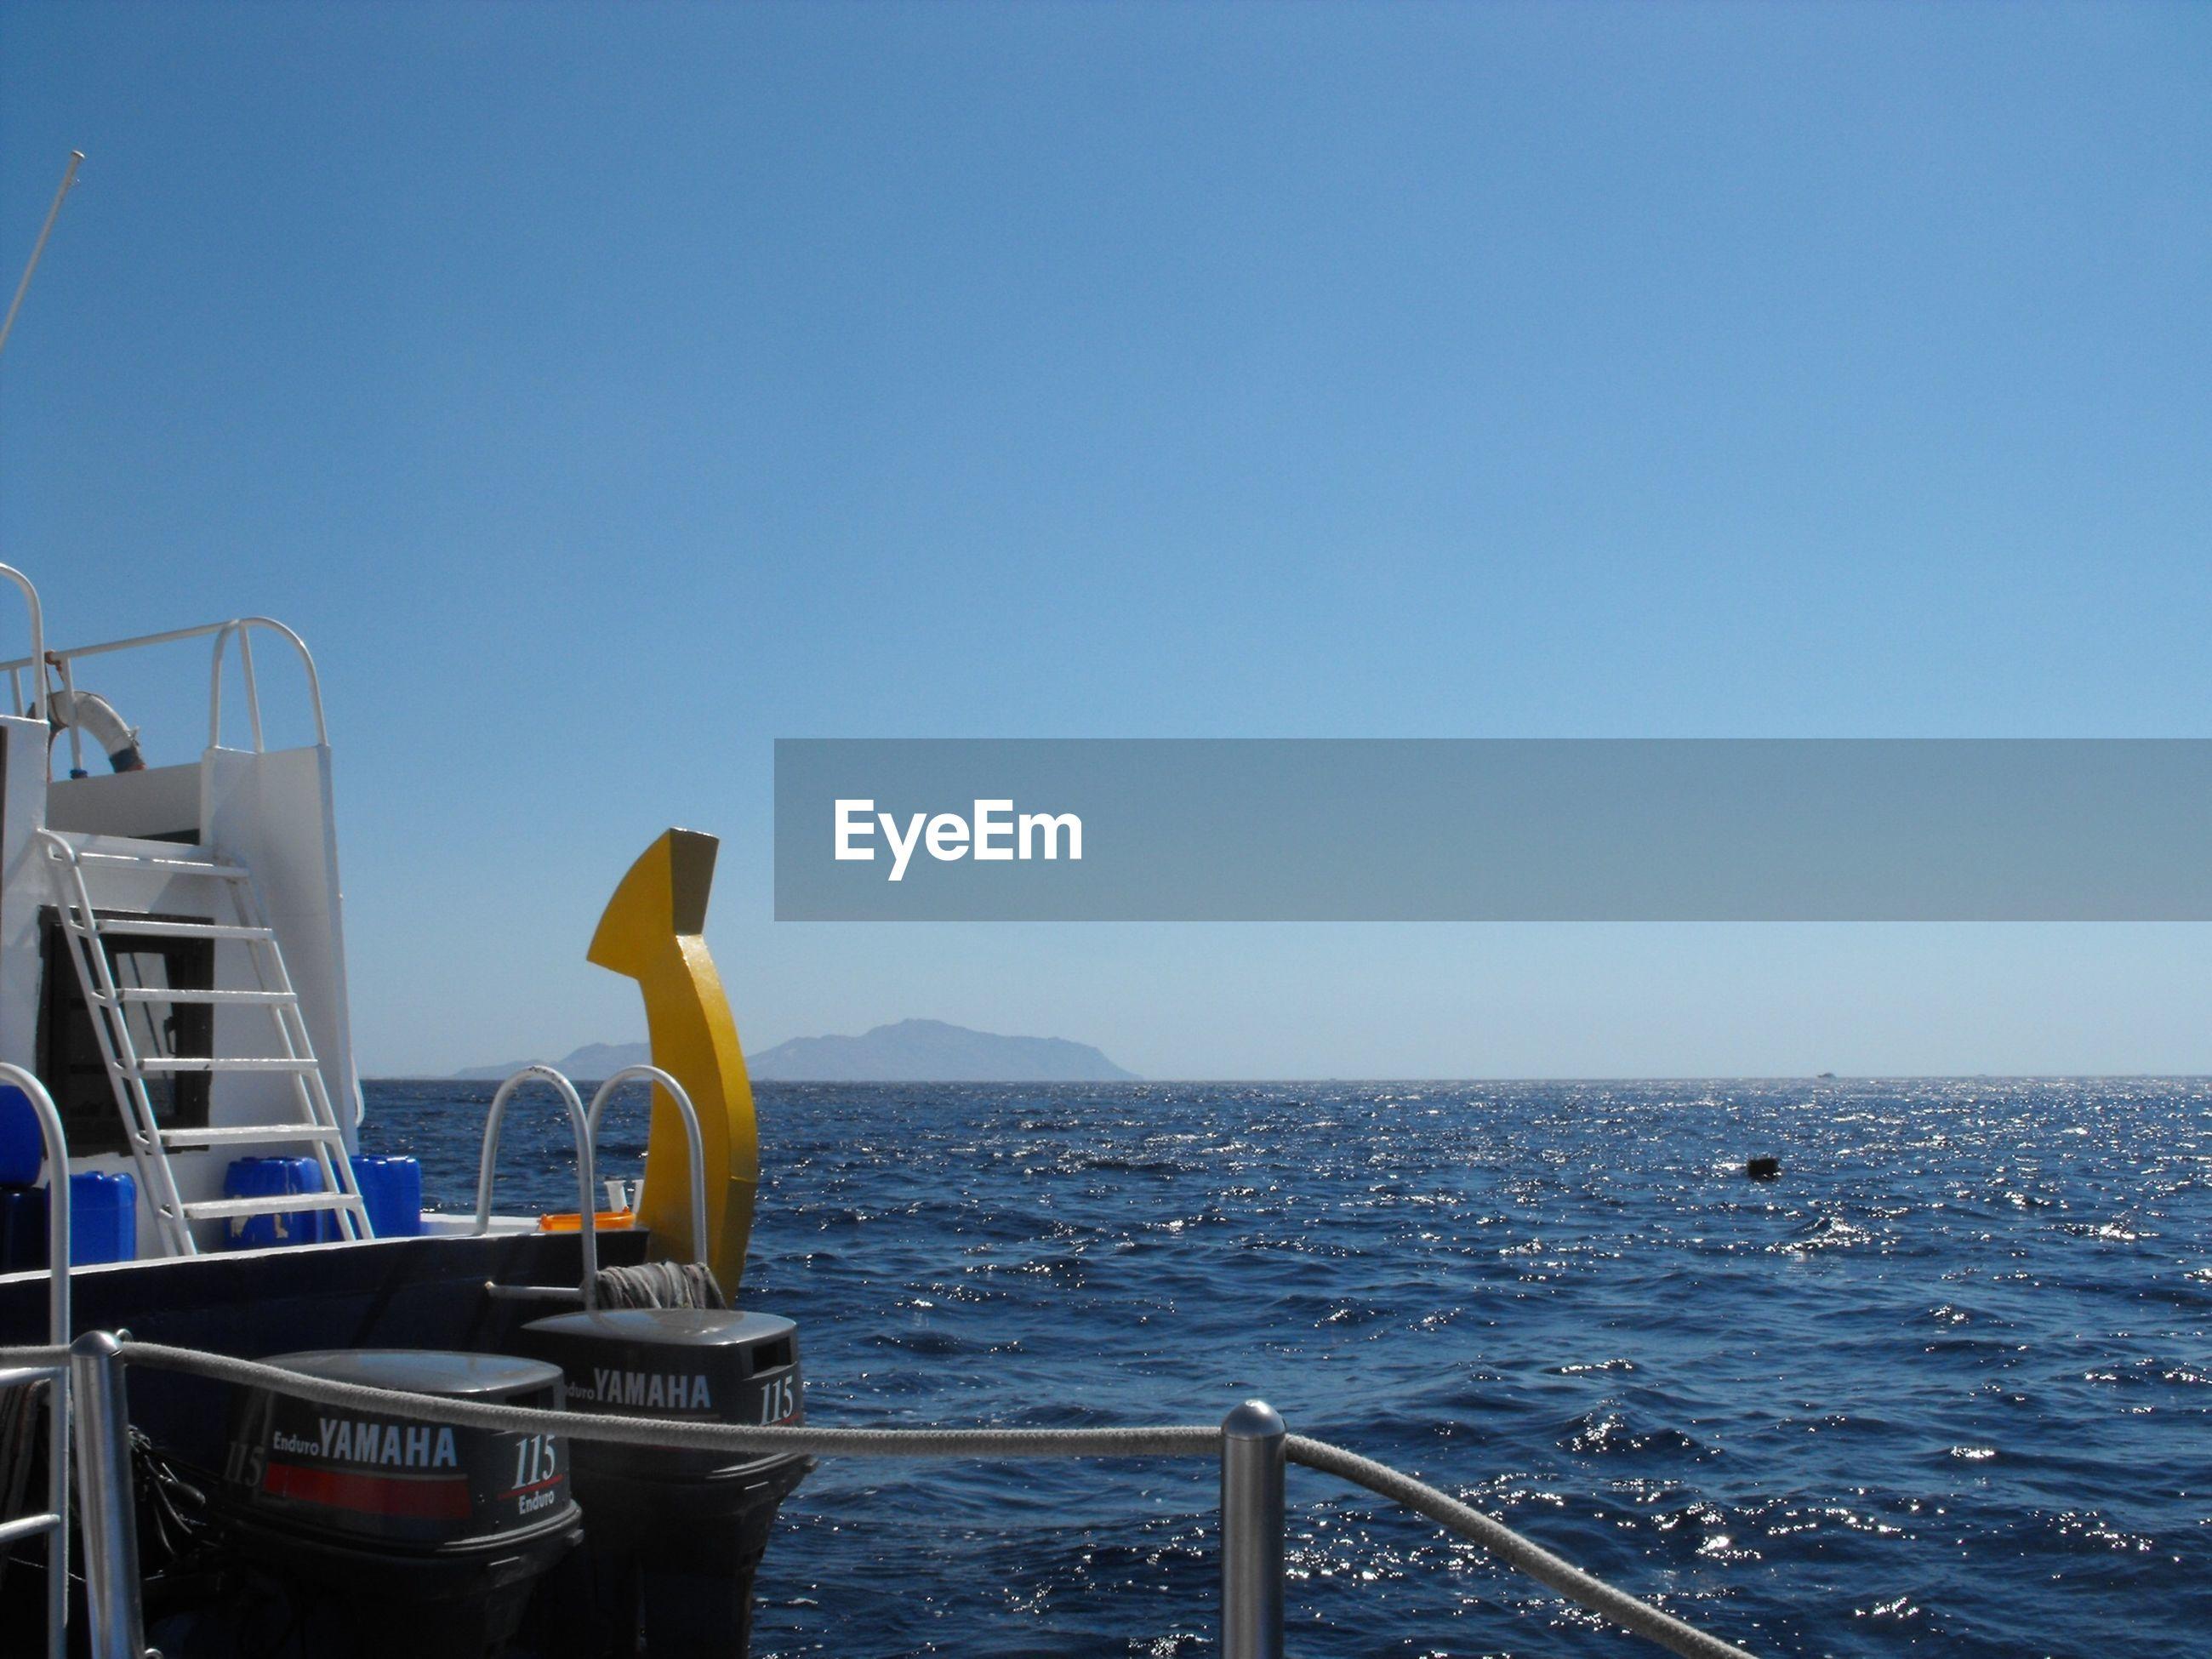 NAUTICAL VESSEL ON SEA AGAINST CLEAR BLUE SKY